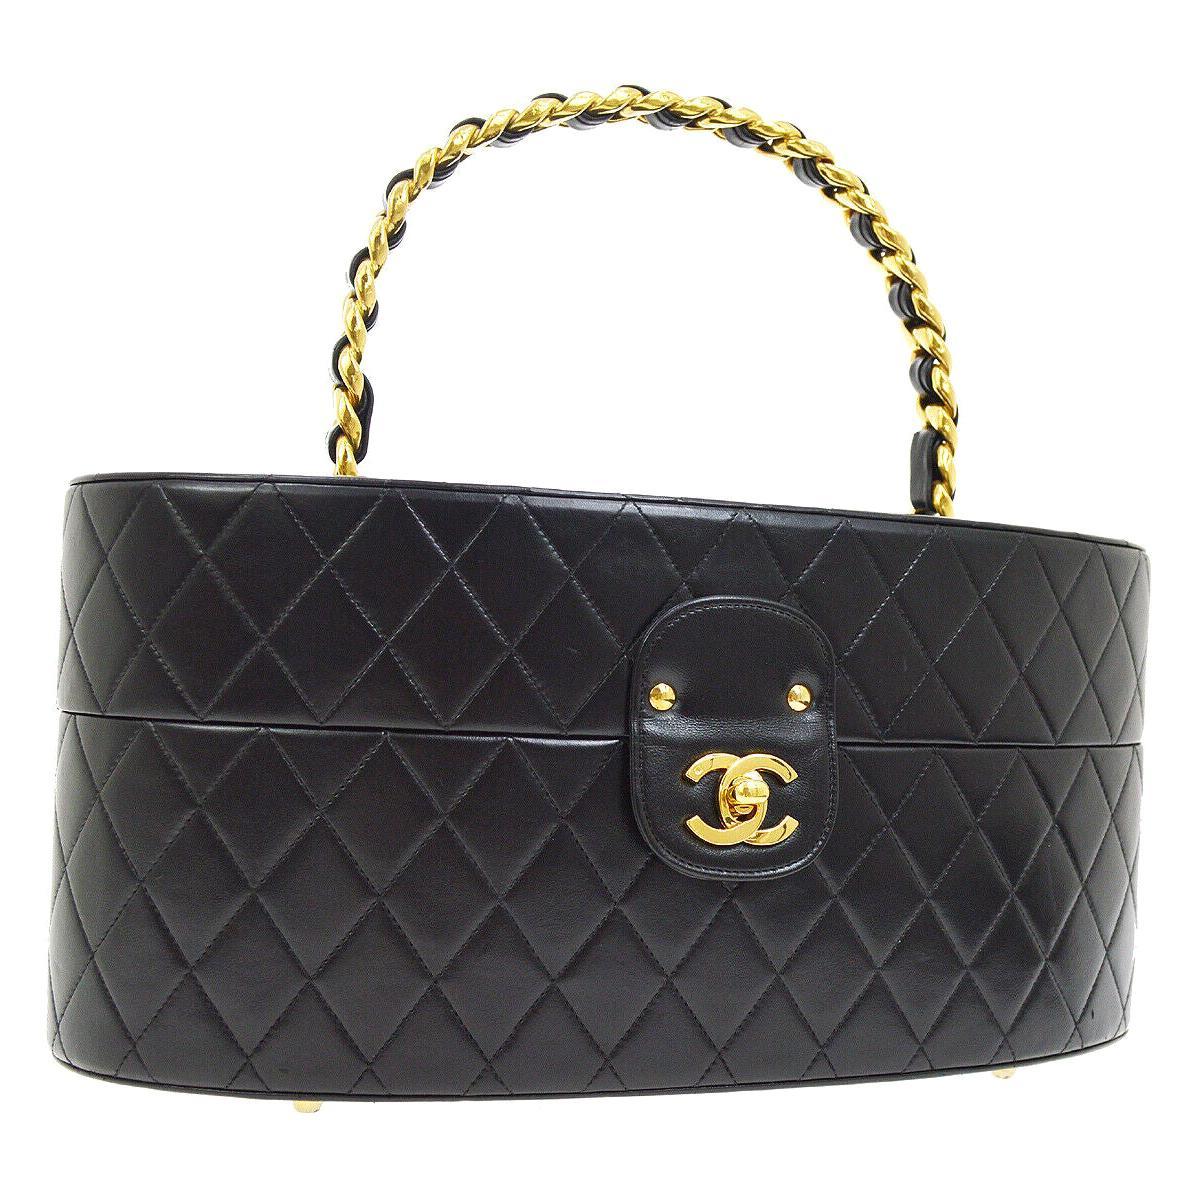 e8b2bdee3710 Vintage Chanel Purses and Handbags at 1stdibs